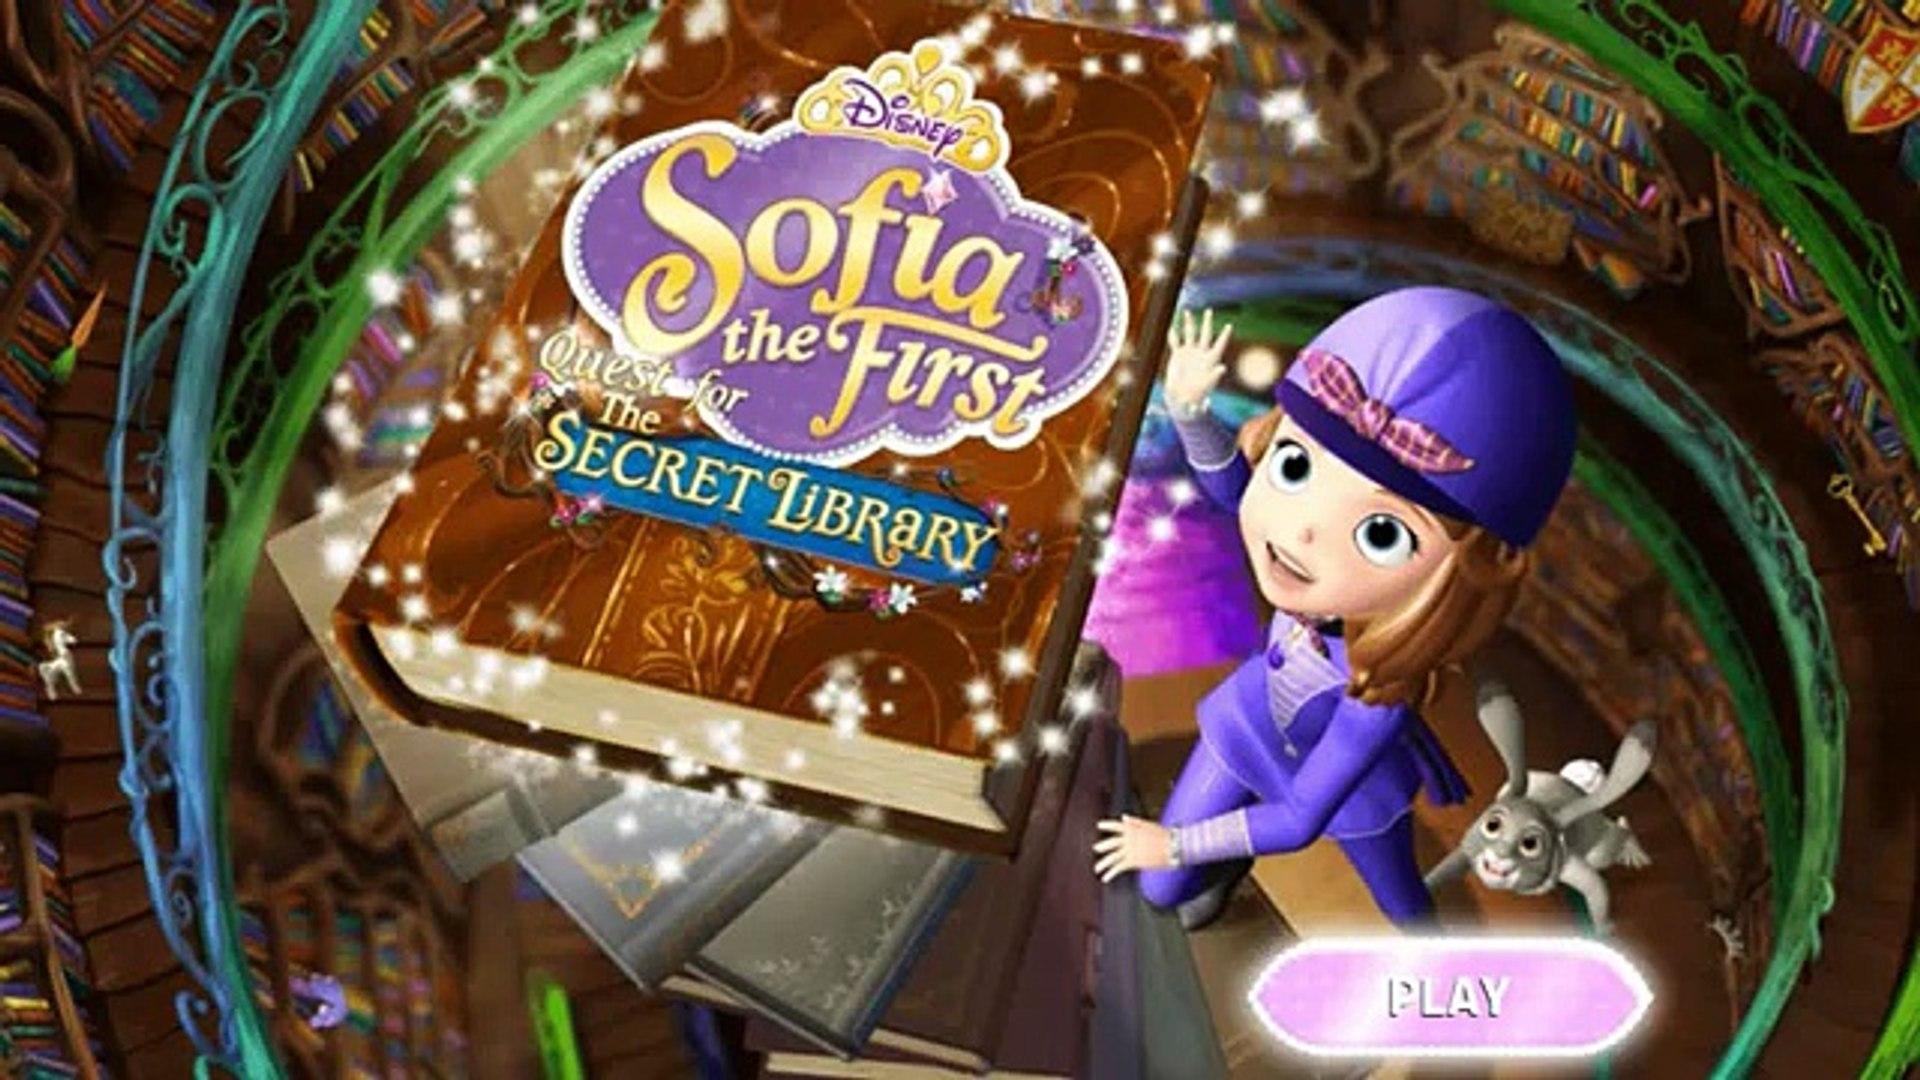 Sofia the First - Quest for the Secret Library/София Прекрасная - Поиски секретной библиотеке